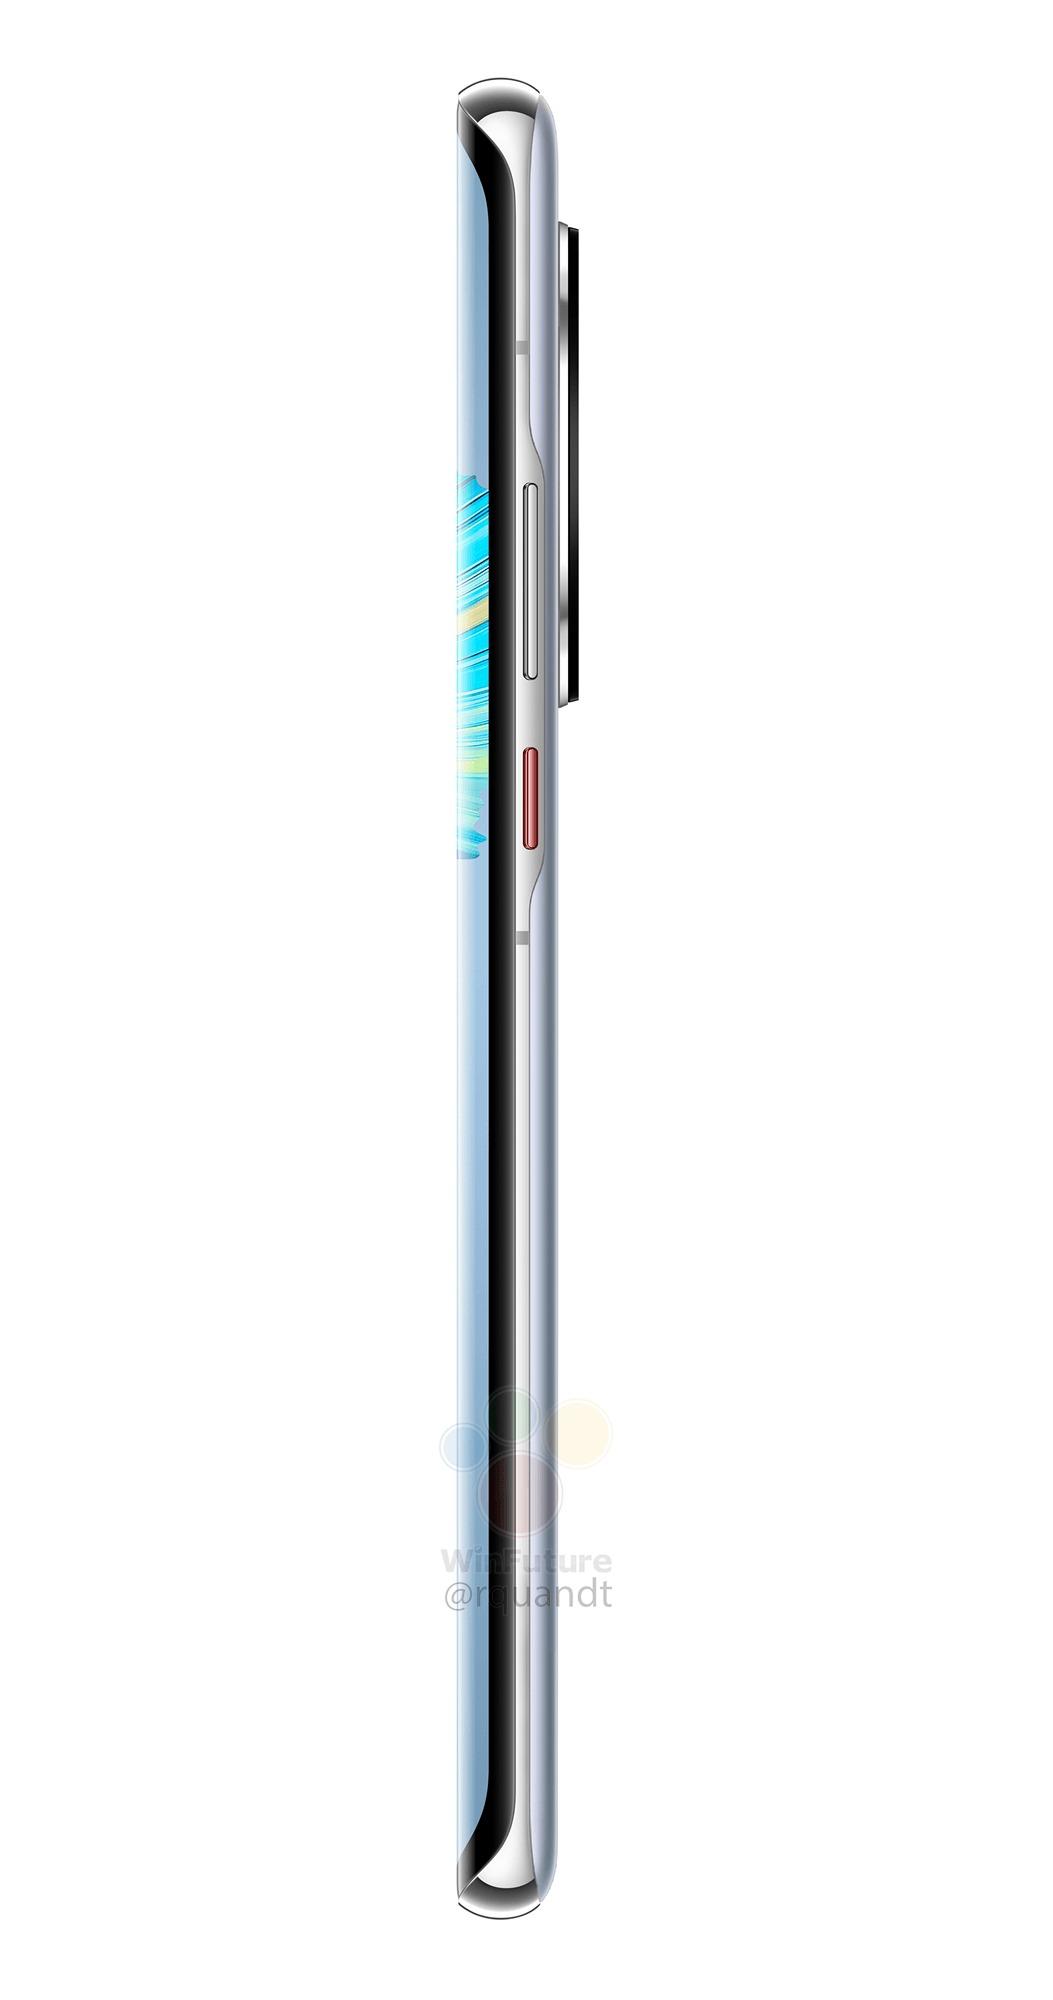 Huawei-Mate-40-Pro-1602925292-0-0